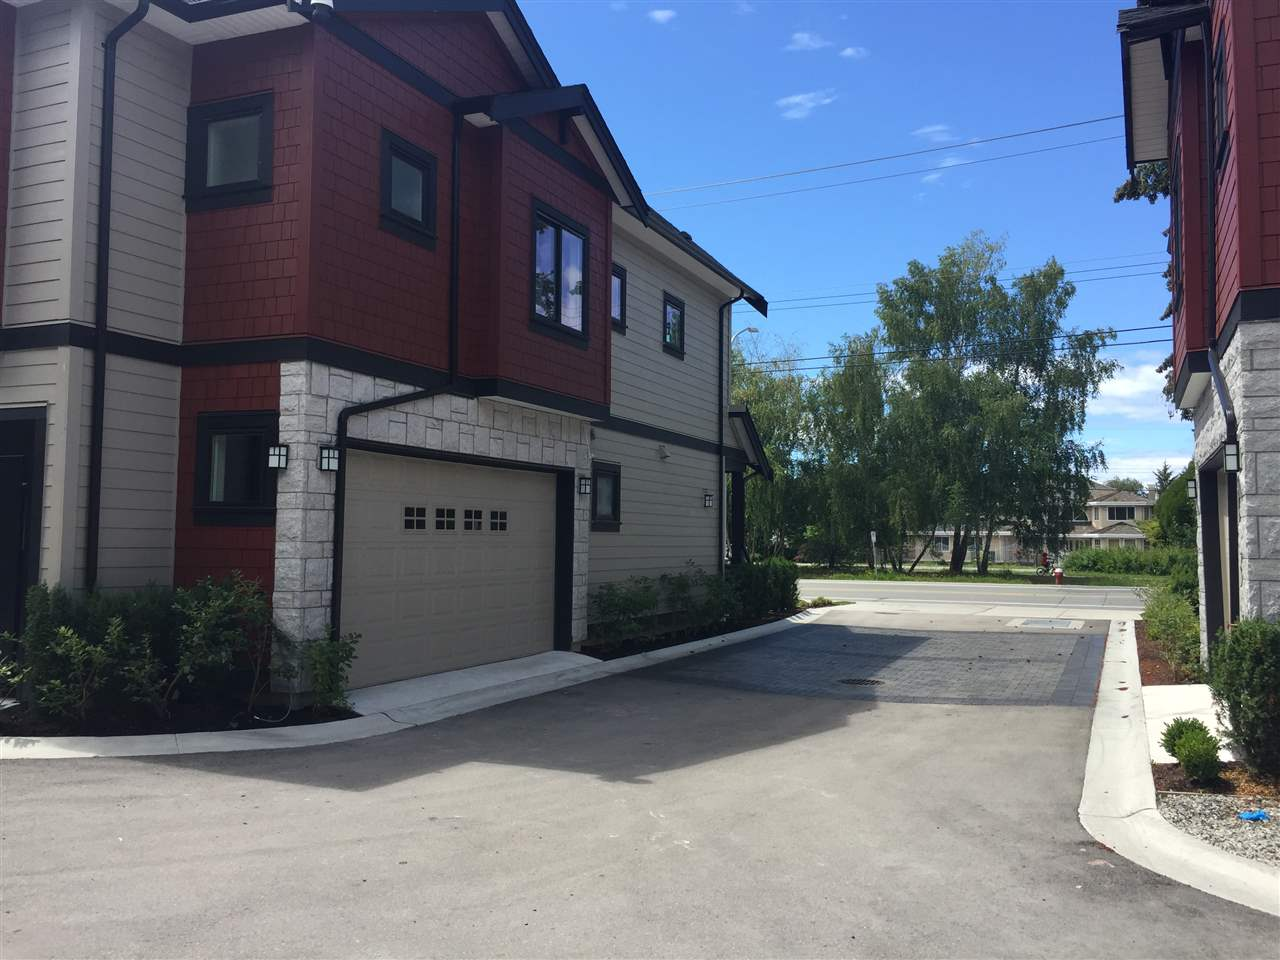 1 7388 RAILWAY AVENUE - Granville Townhouse for sale, 4 Bedrooms (R2362775)